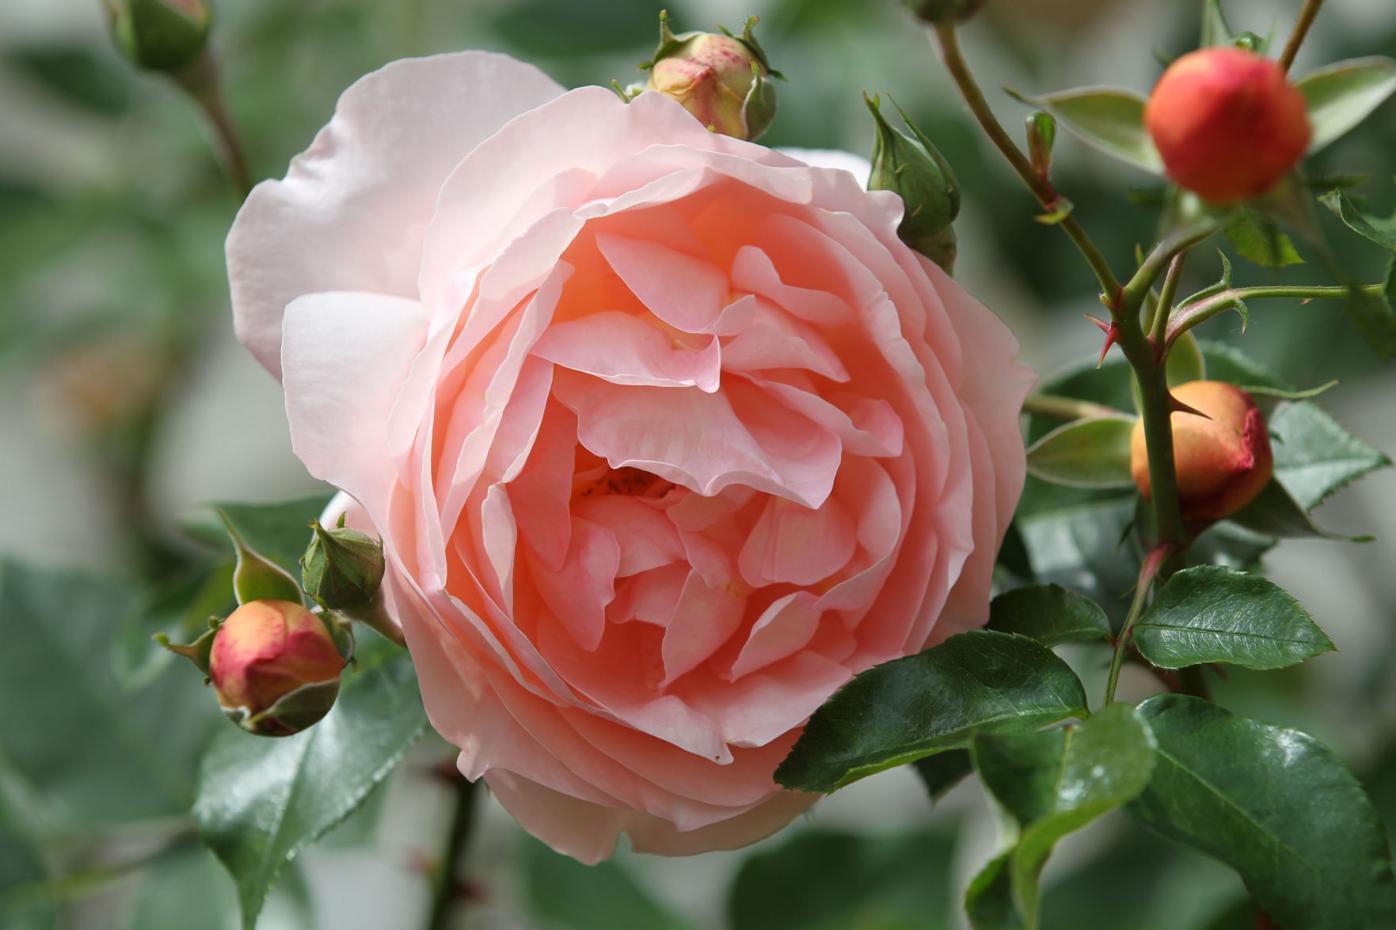 djr-2021-05-02-liv-rose-show-twp4